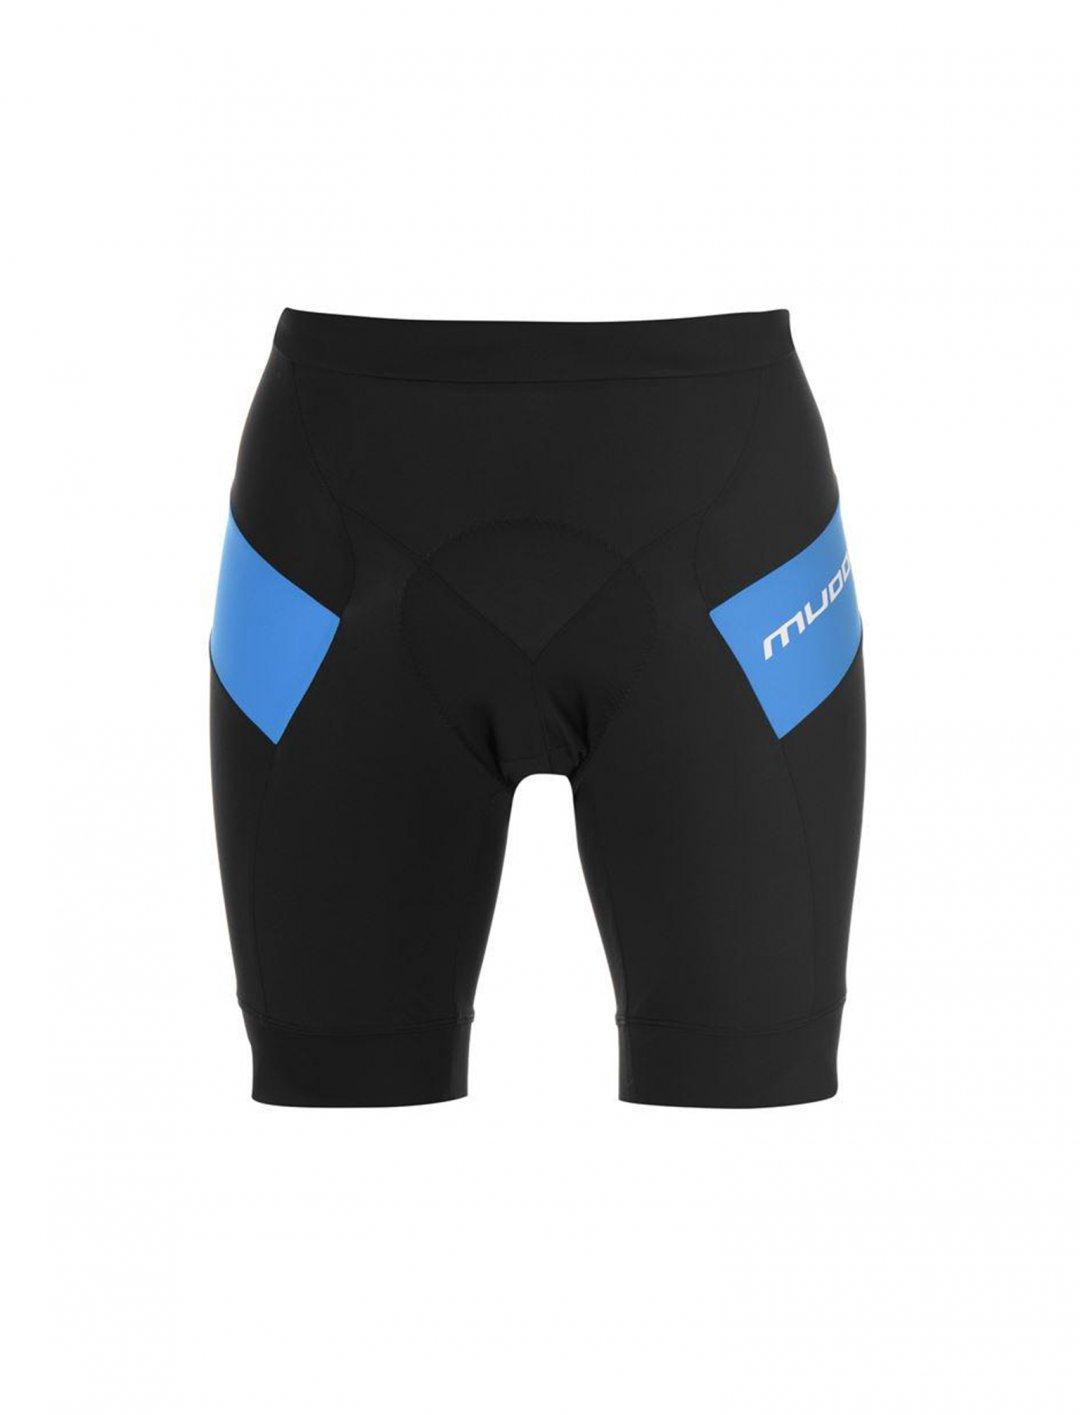 "Muddyfox Pure Short {""id"":5,""product_section_id"":1,""name"":""Clothing"",""order"":5} Muddyfox"